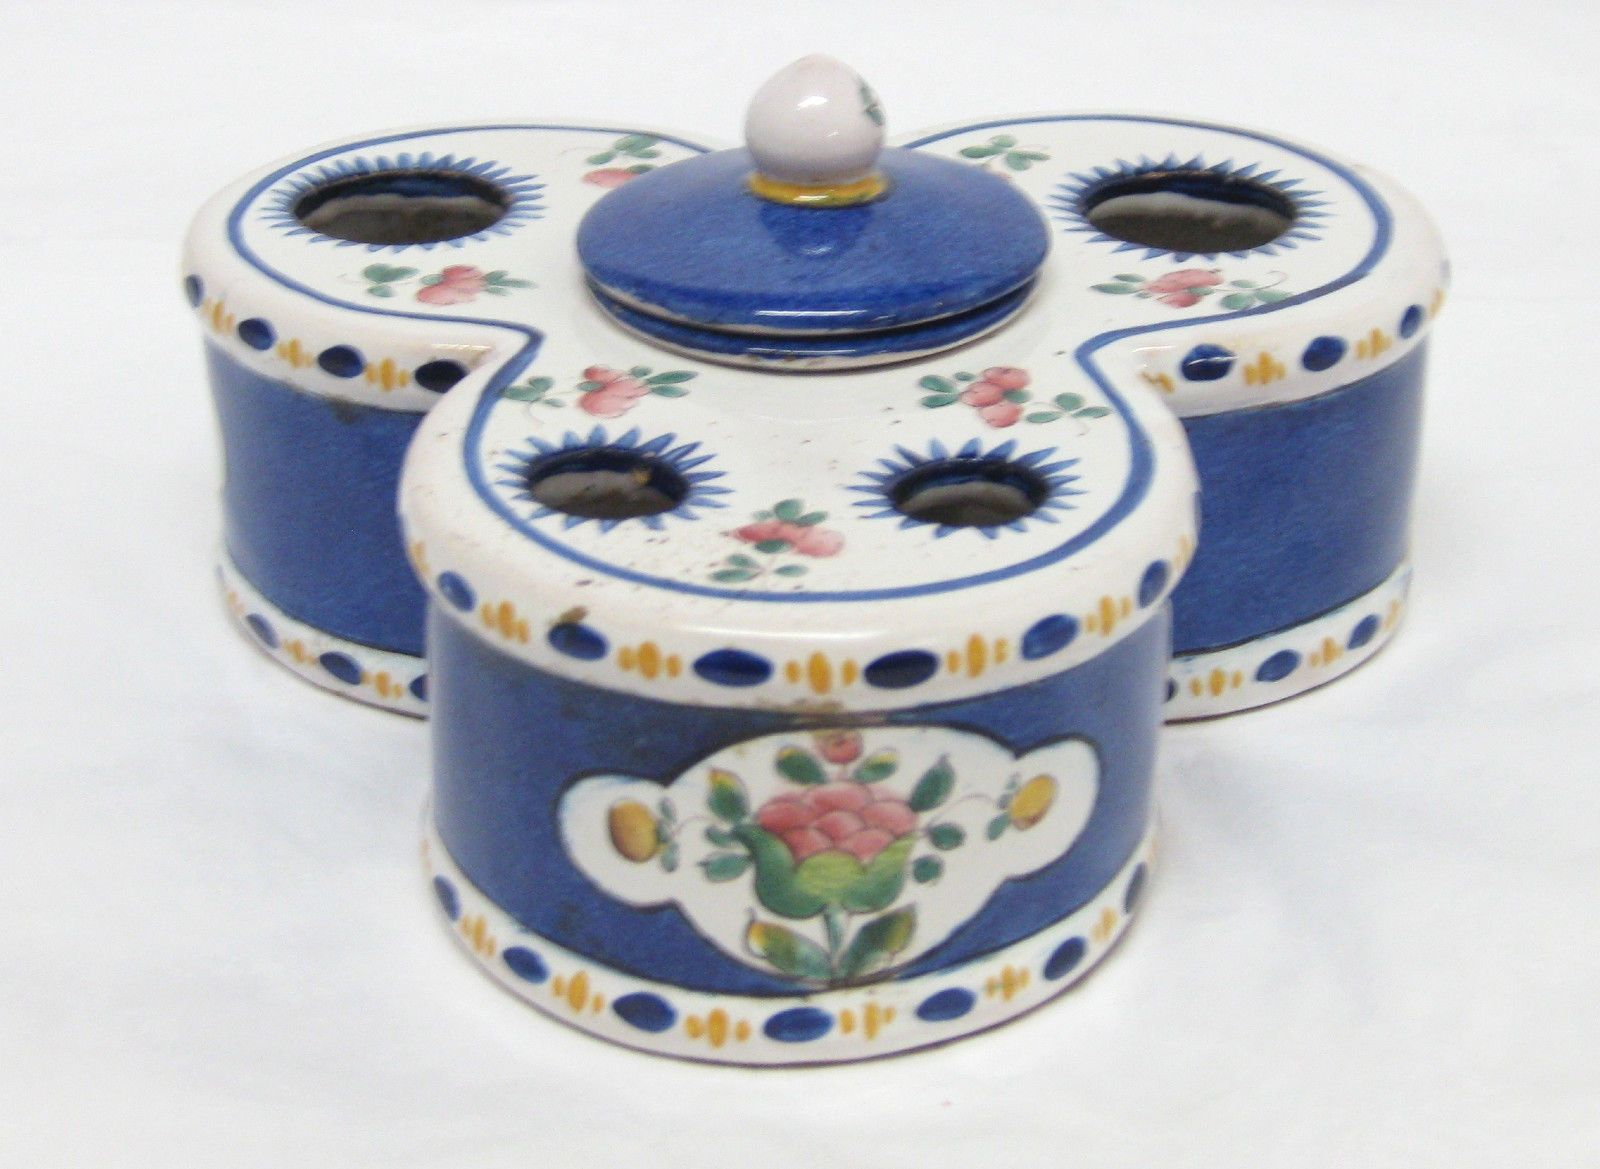 19th Century Quimper Porcelain Inkwell Blue White Pink Floral Striped Design | eBay